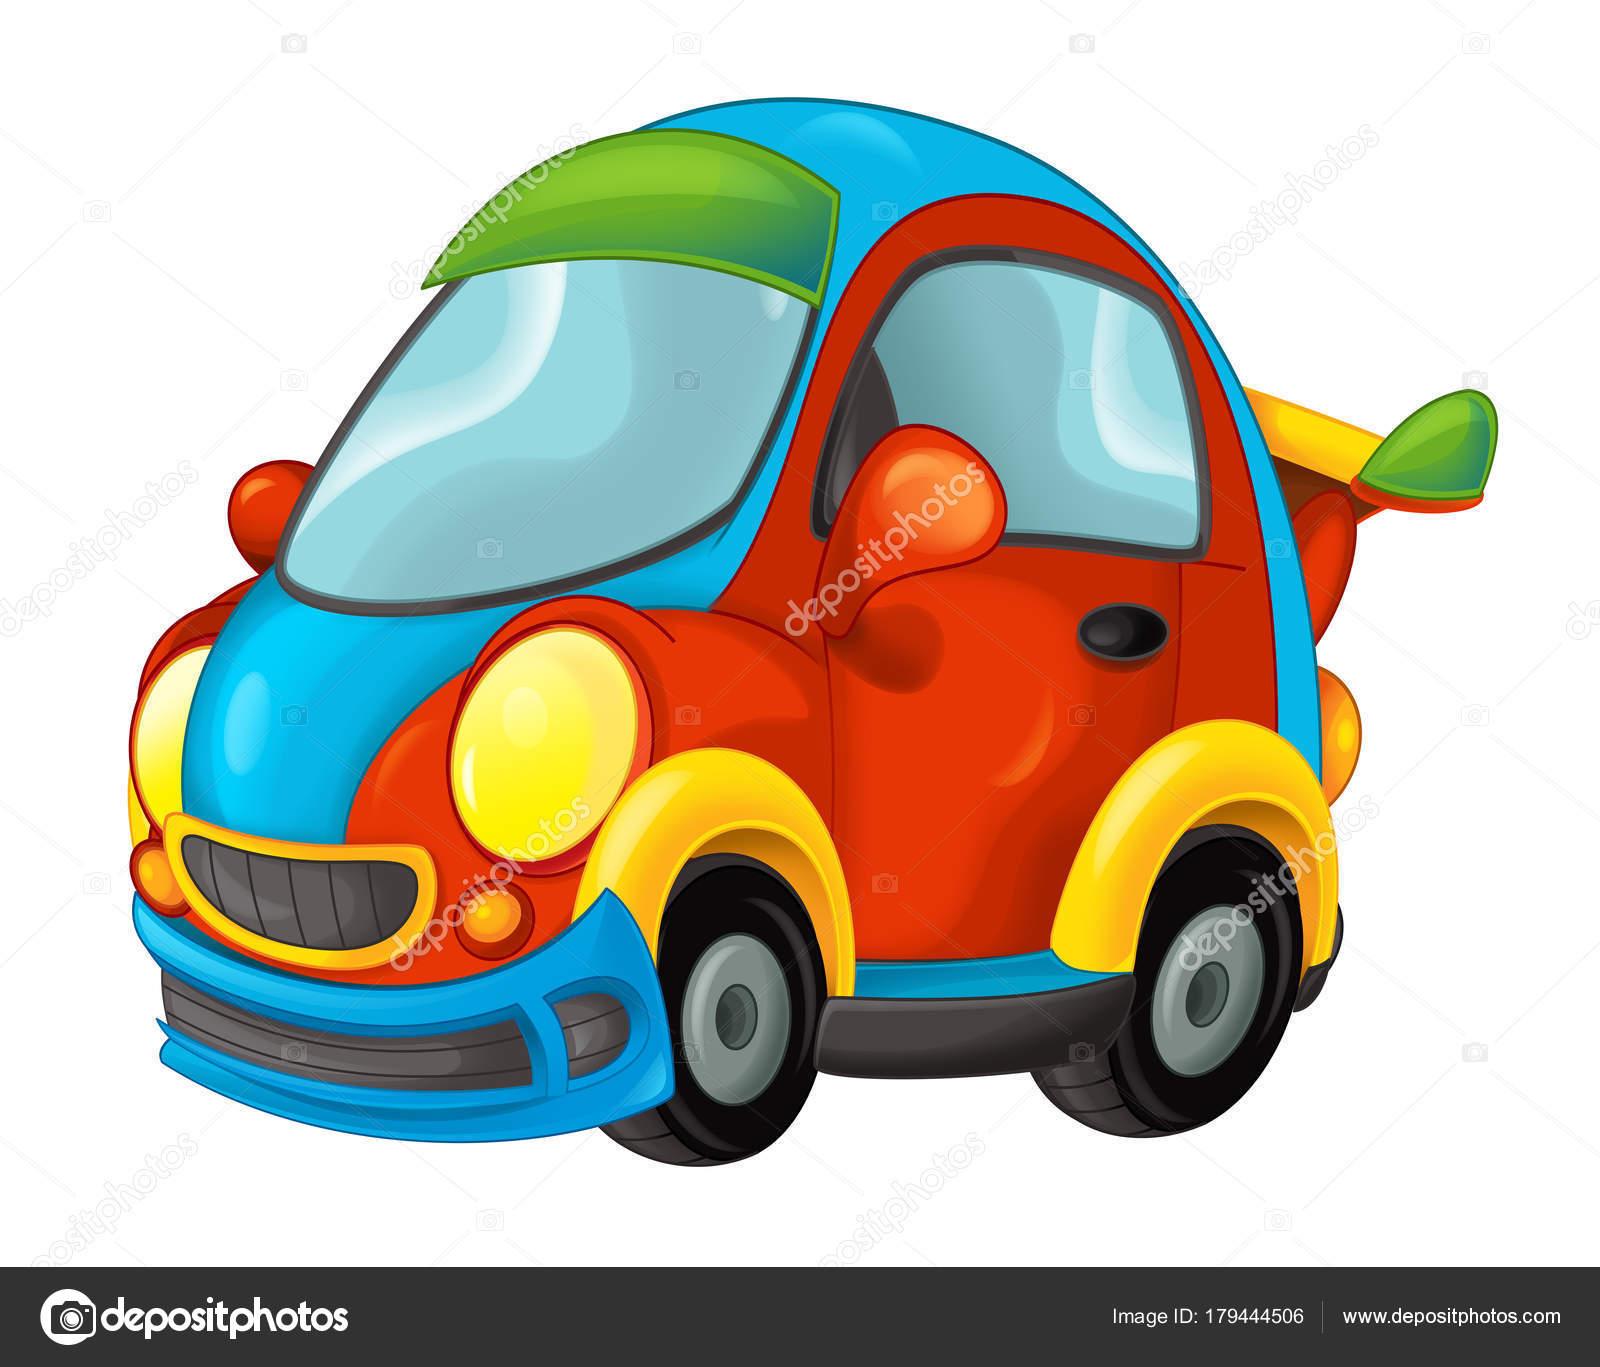 Cartoon Lustig Aussehenden Auto Illustration Für Kinder Stockfoto